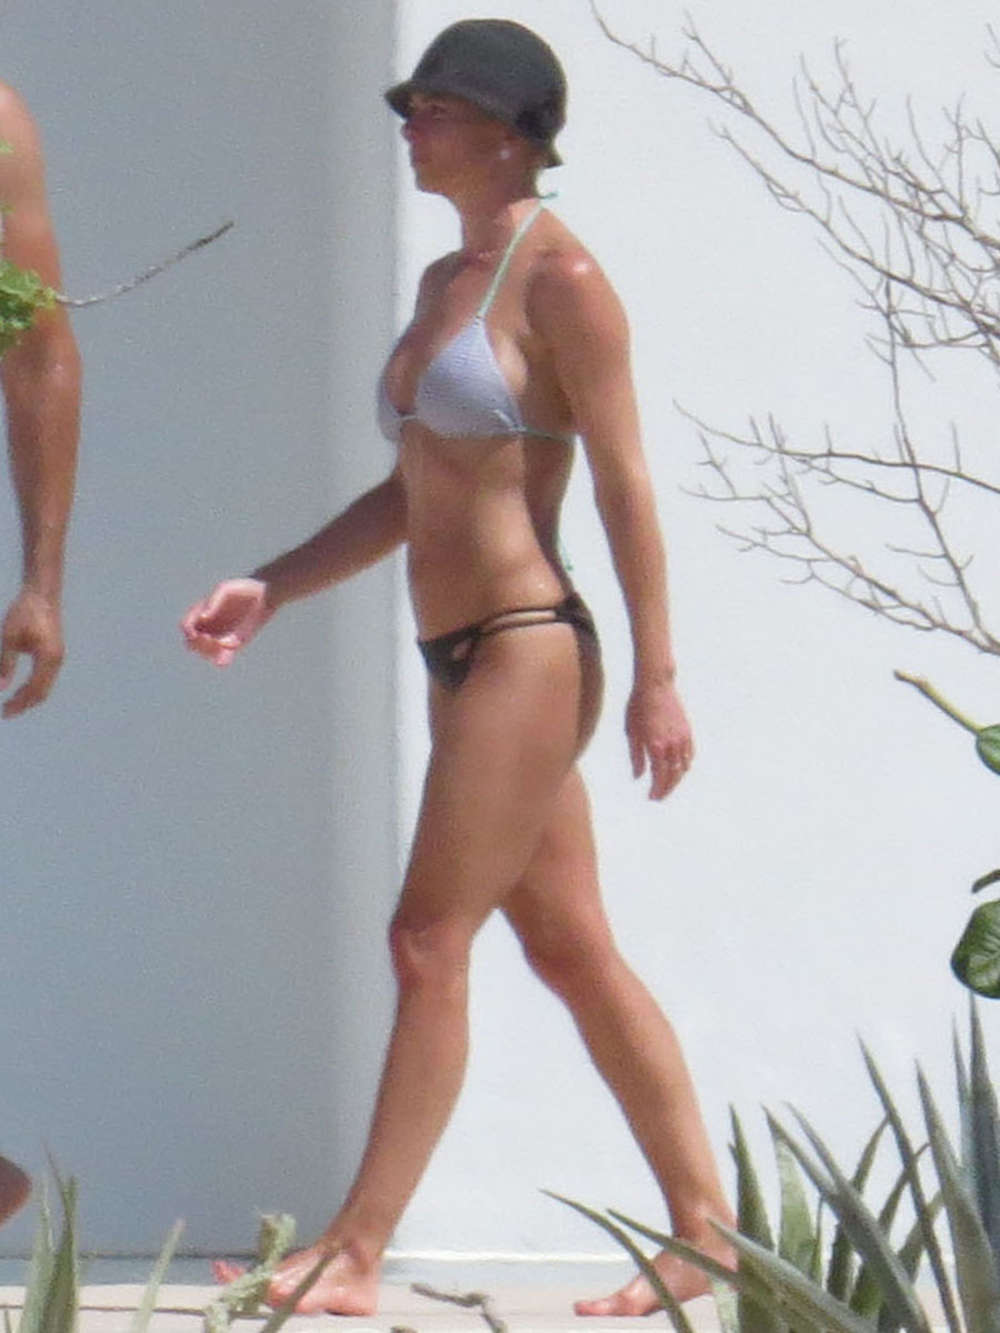 Jaime pressley bikini